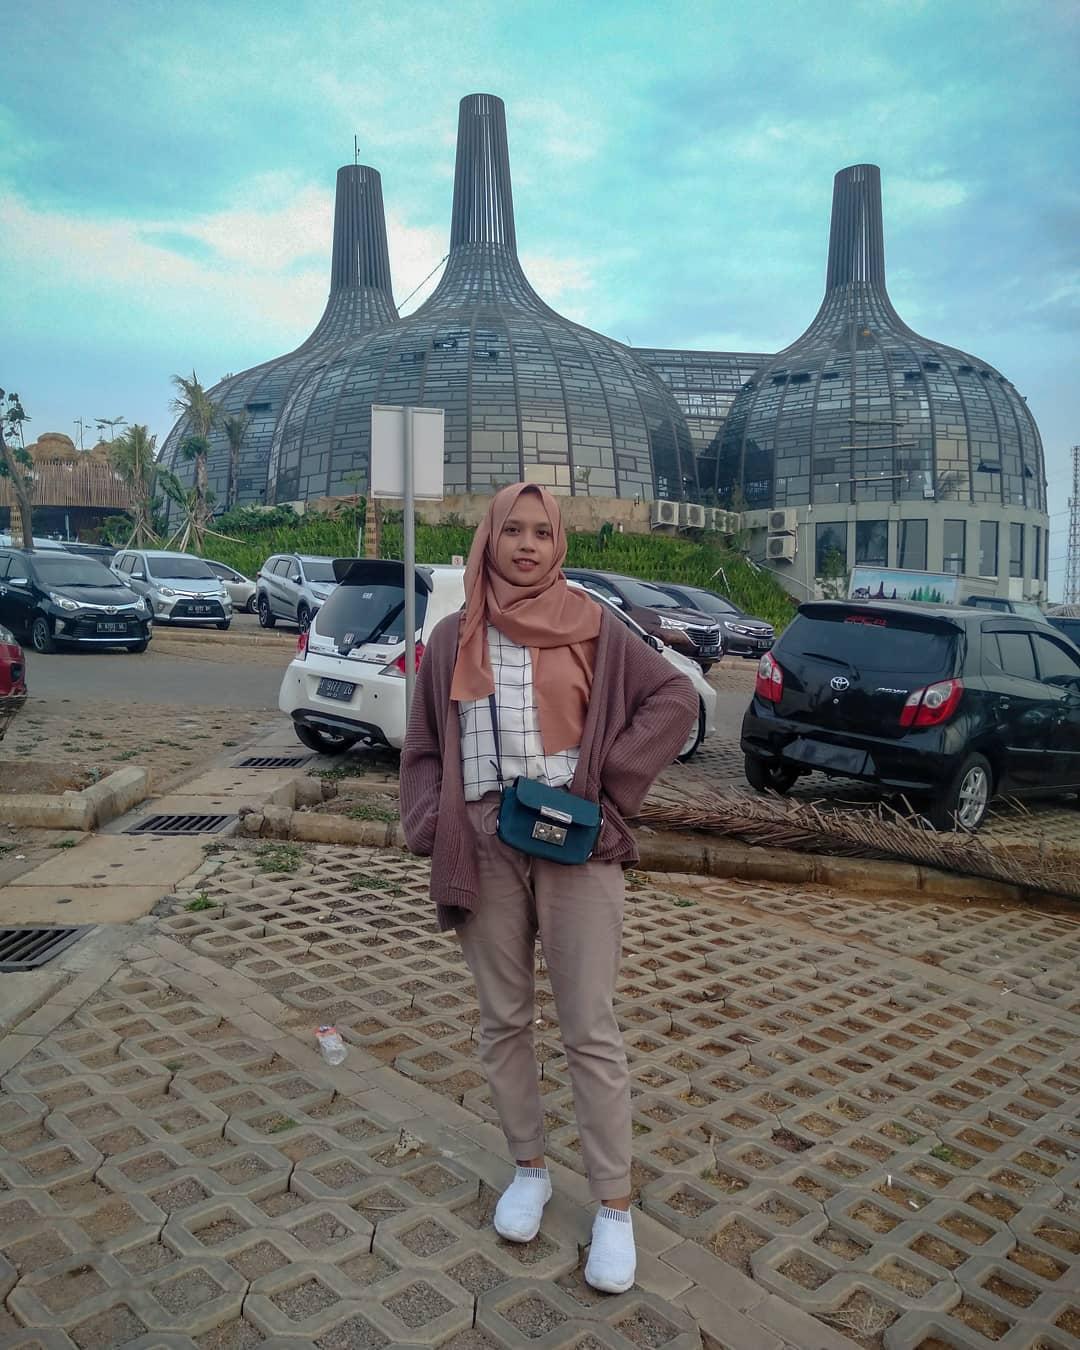 Wisata Semarang Terbaru: Tiket Masuk Dusun Semilir Eco Park 2020, Wahana & Fasilitas